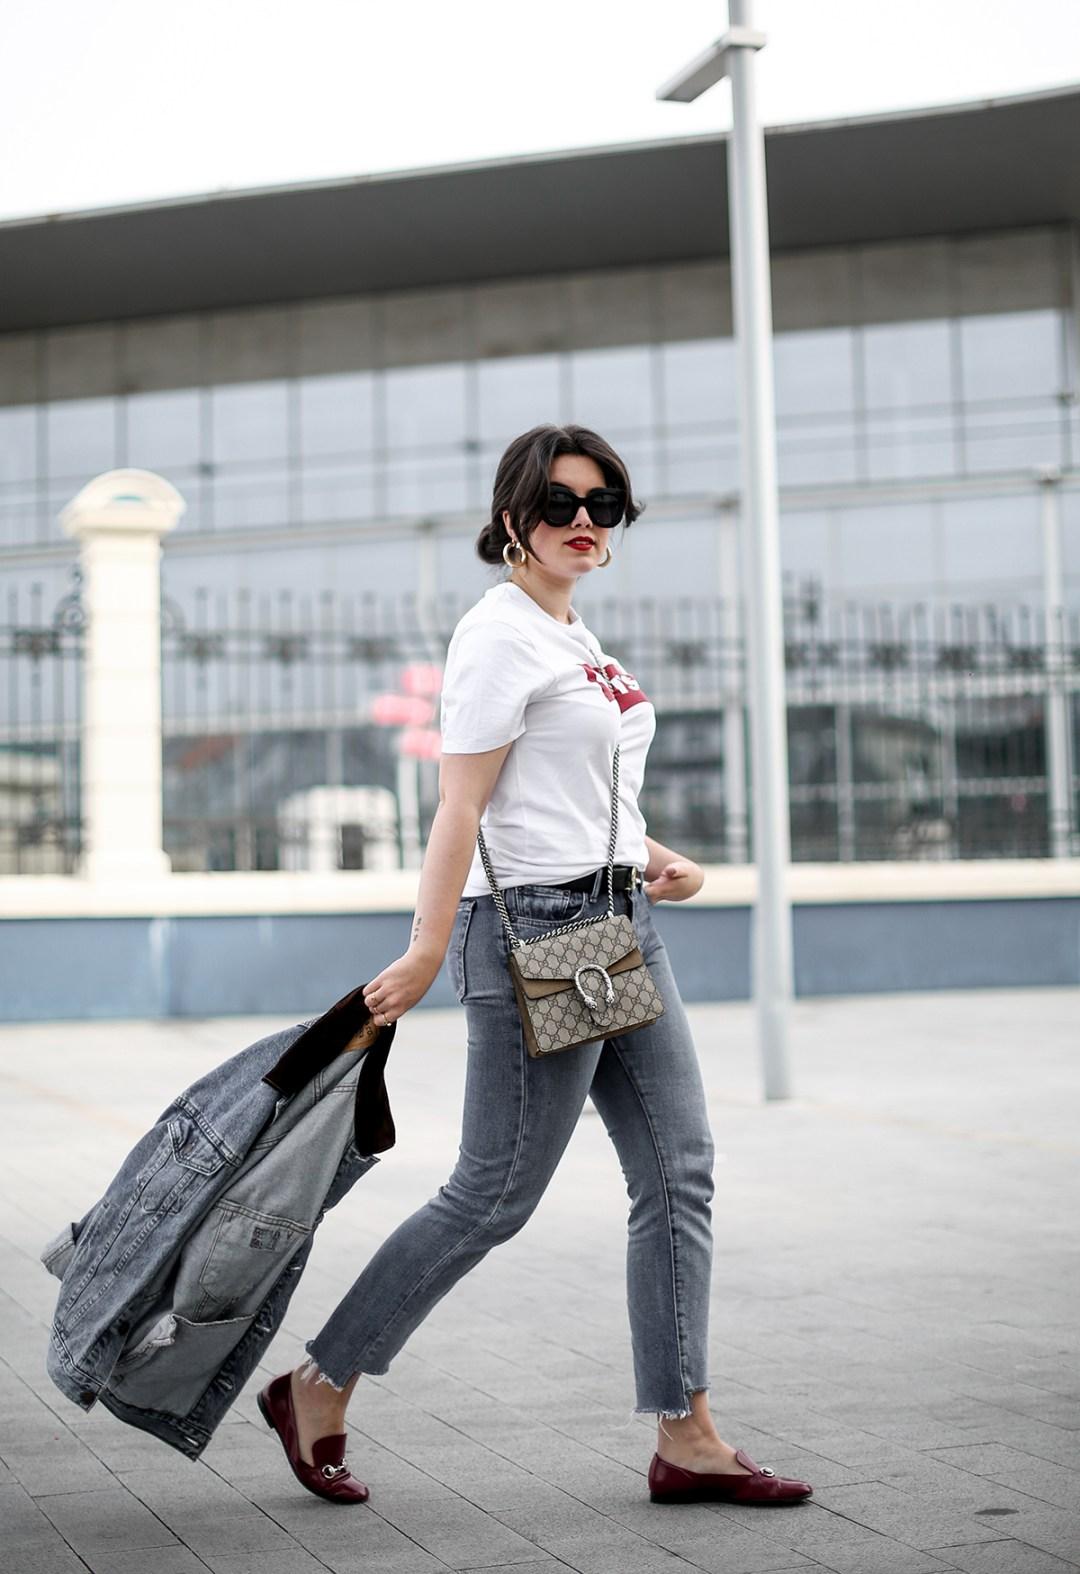 denim-total-look-levis-girl-vintage-gucci-horsebit-shoes-dionysus-bag4